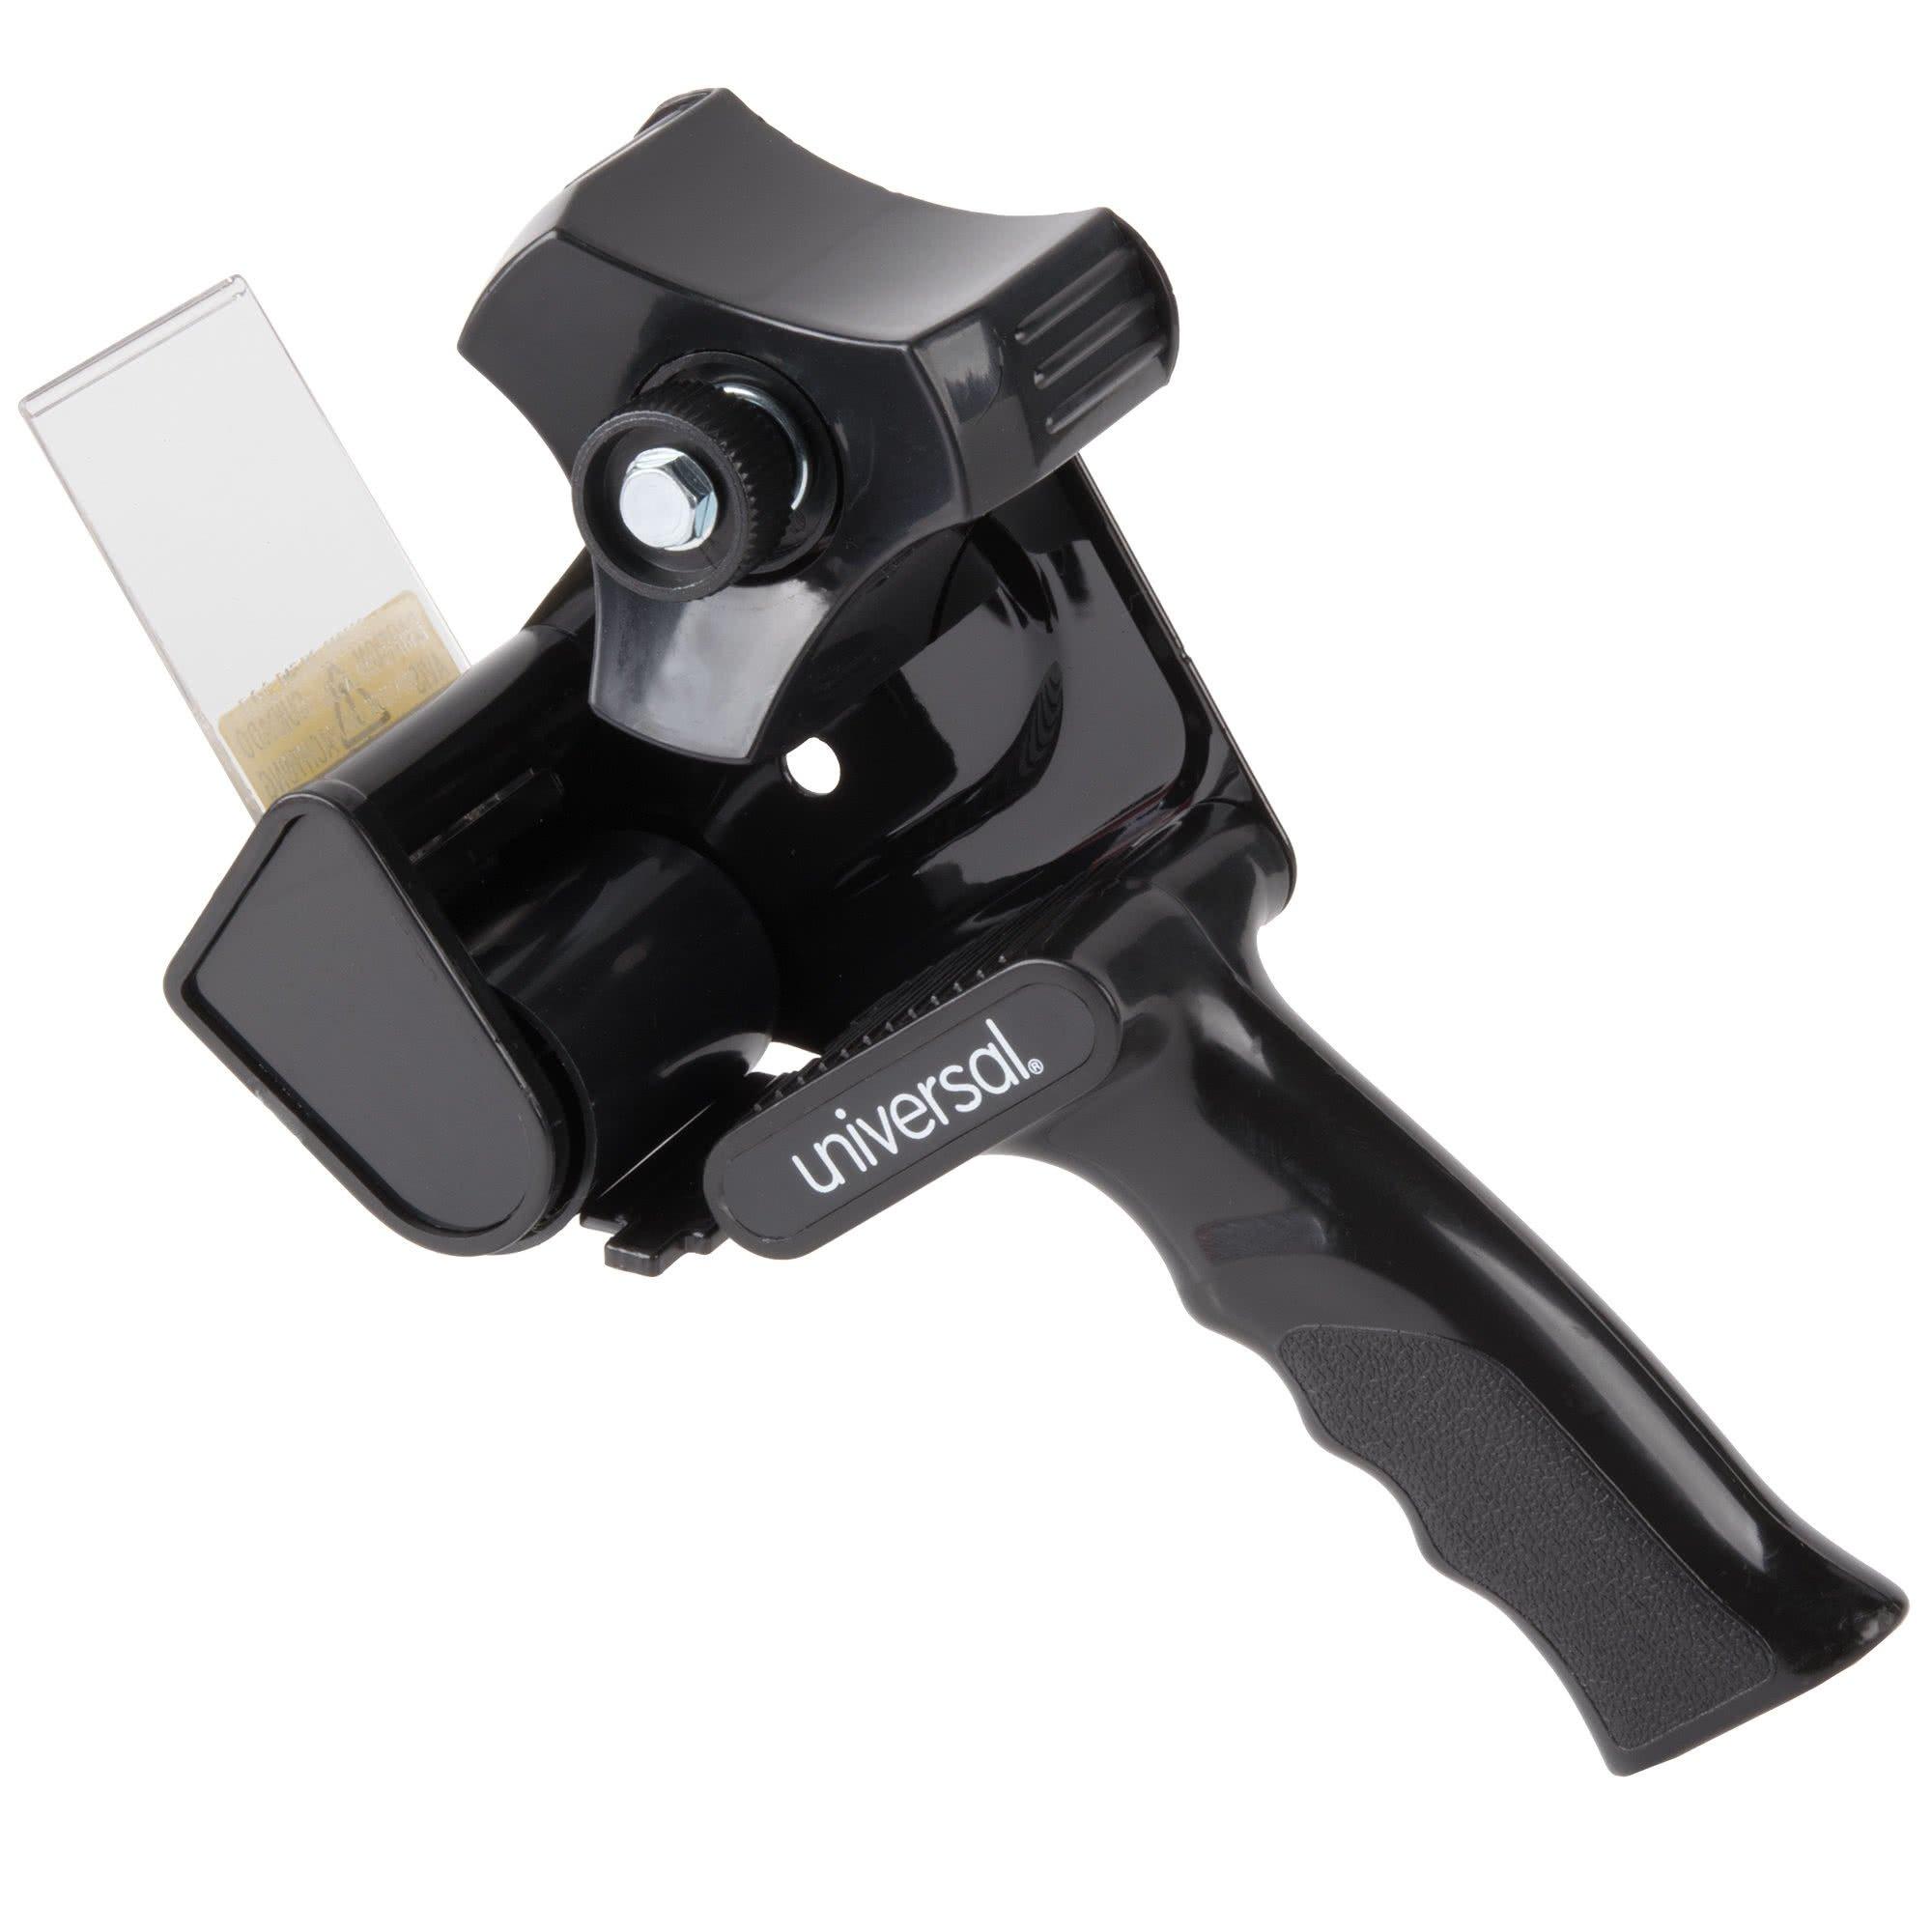 TableTop King UNV88000 3'' Core Black Handheld Box Sealing Tape Dispenser